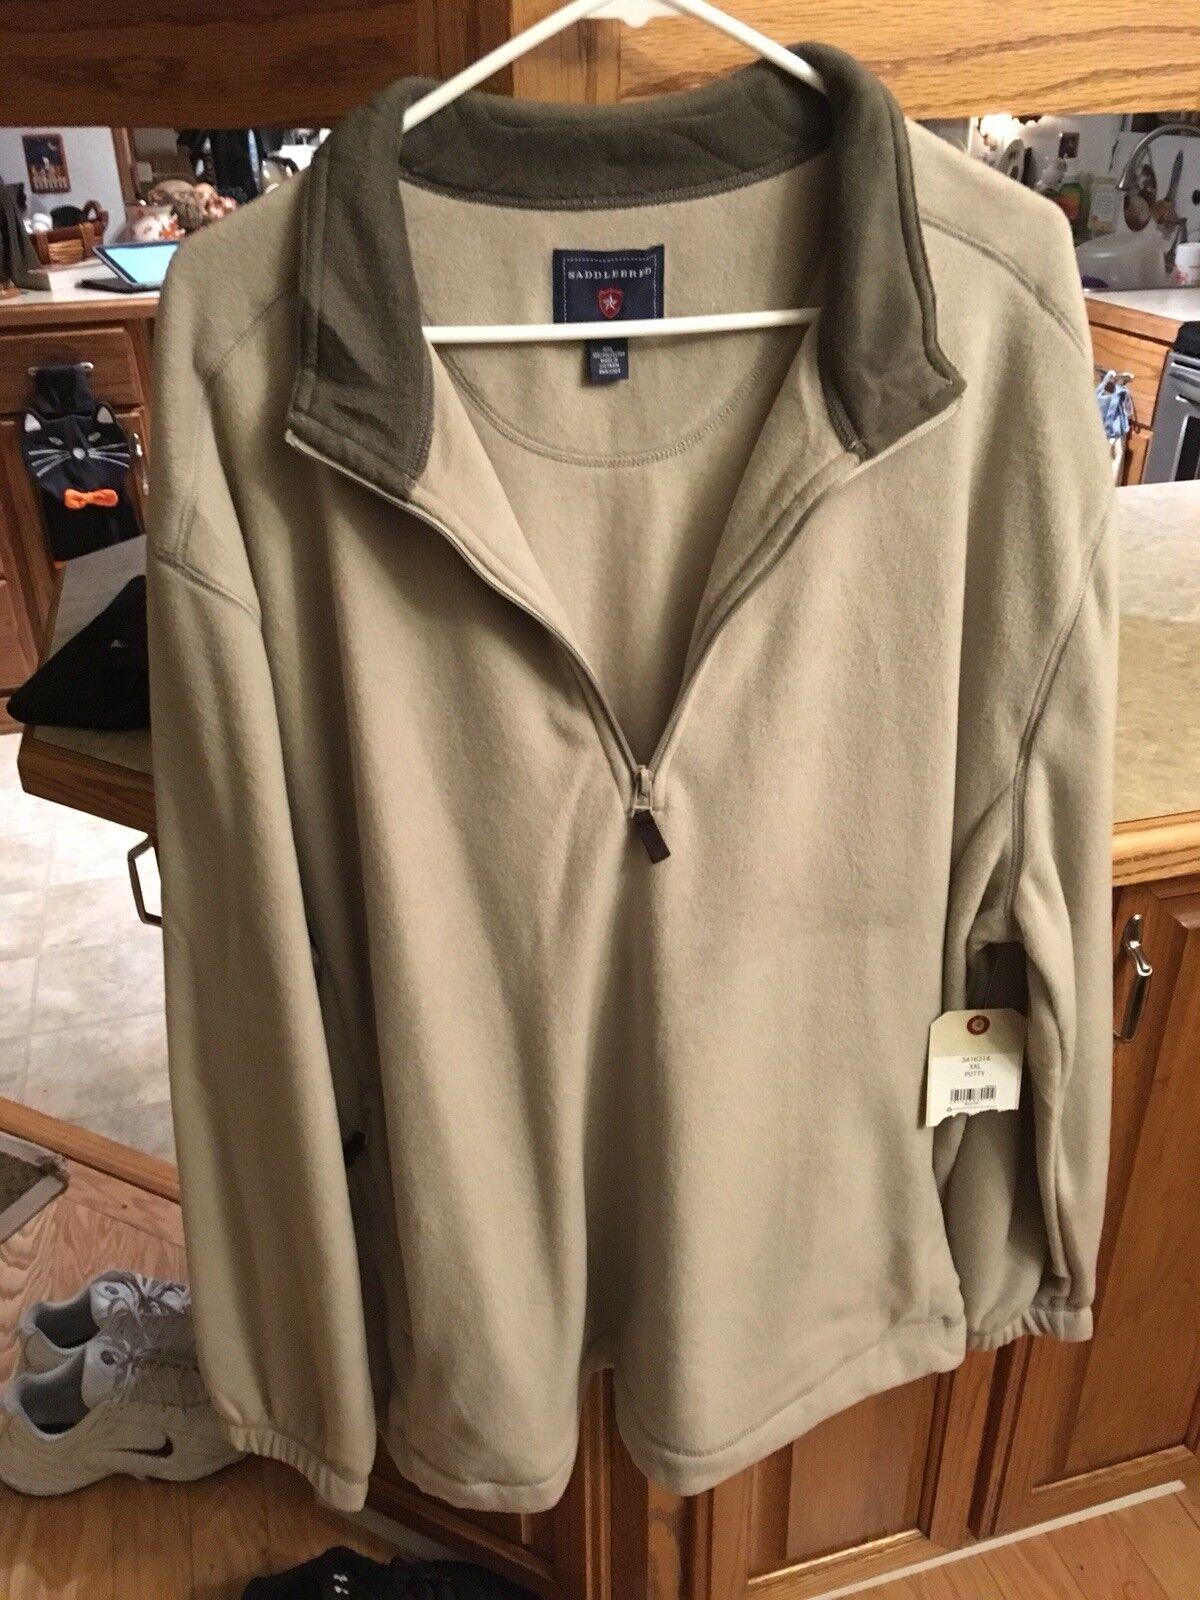 NEW SaddlebROT fleece pullover 2XL